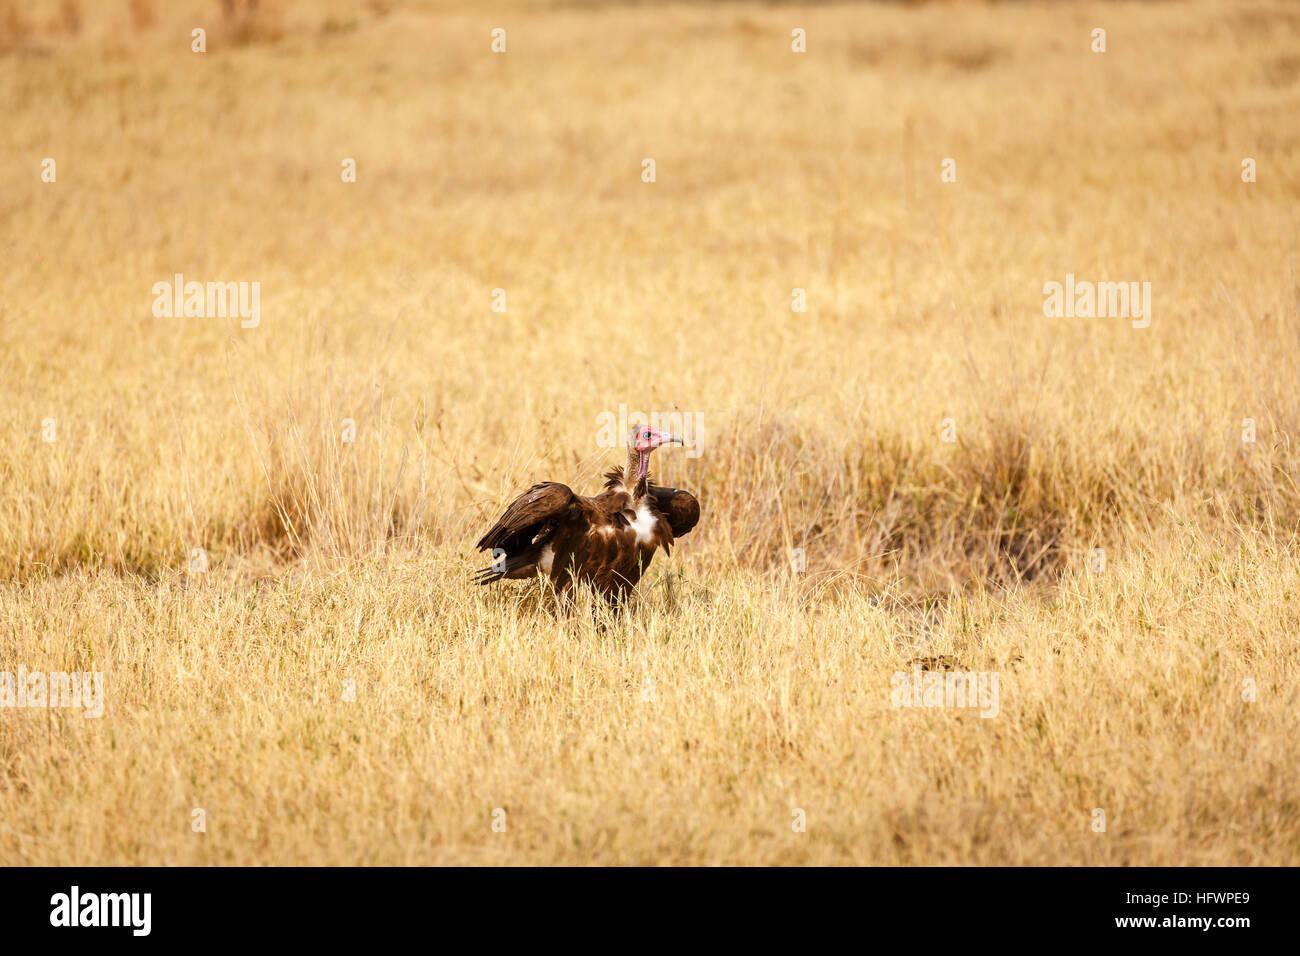 Hooded vulture (Necrosyrtes monachus), Sandibe Camp, adjacent to the Moremi Game Reserve, Okavango Delta, Botswana, - Stock Image